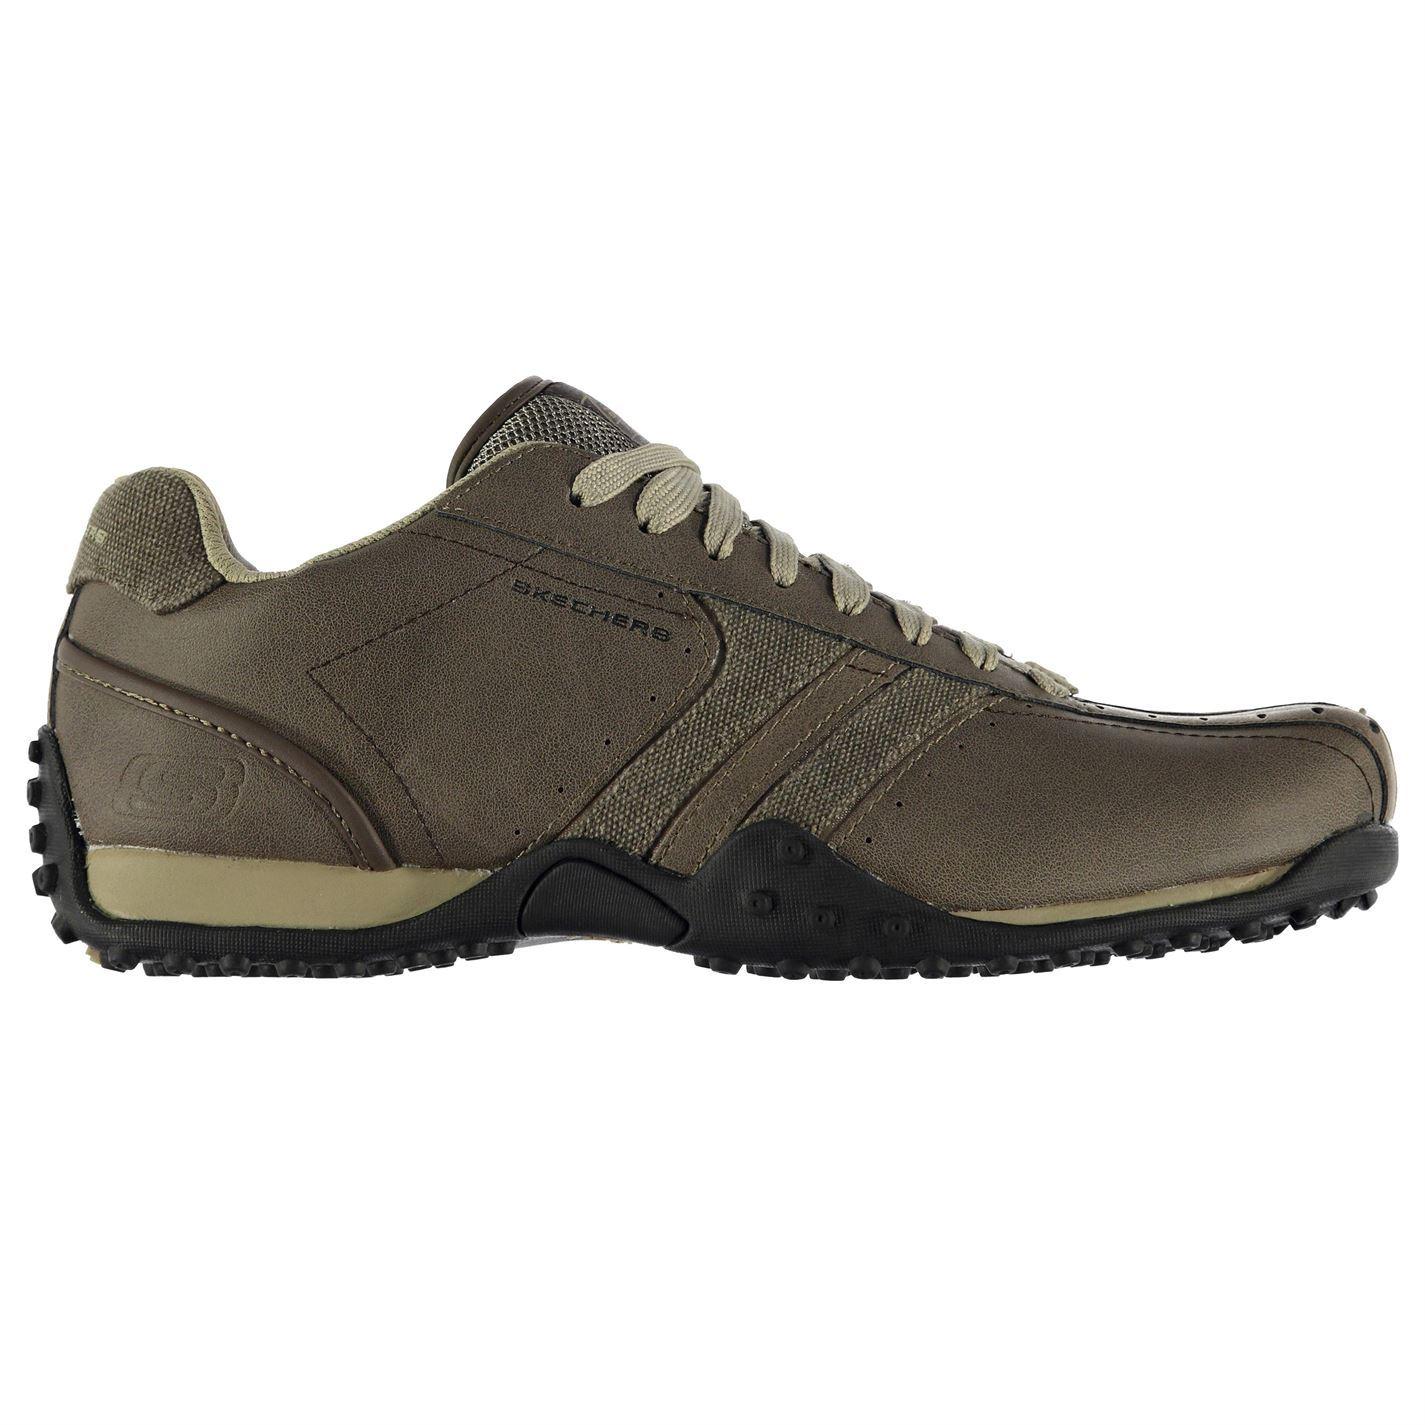 Skechers-Urban-Track-Forward-Trainers-Mens-Athleisure-Footwear-Shoes-Sneakers thumbnail 18